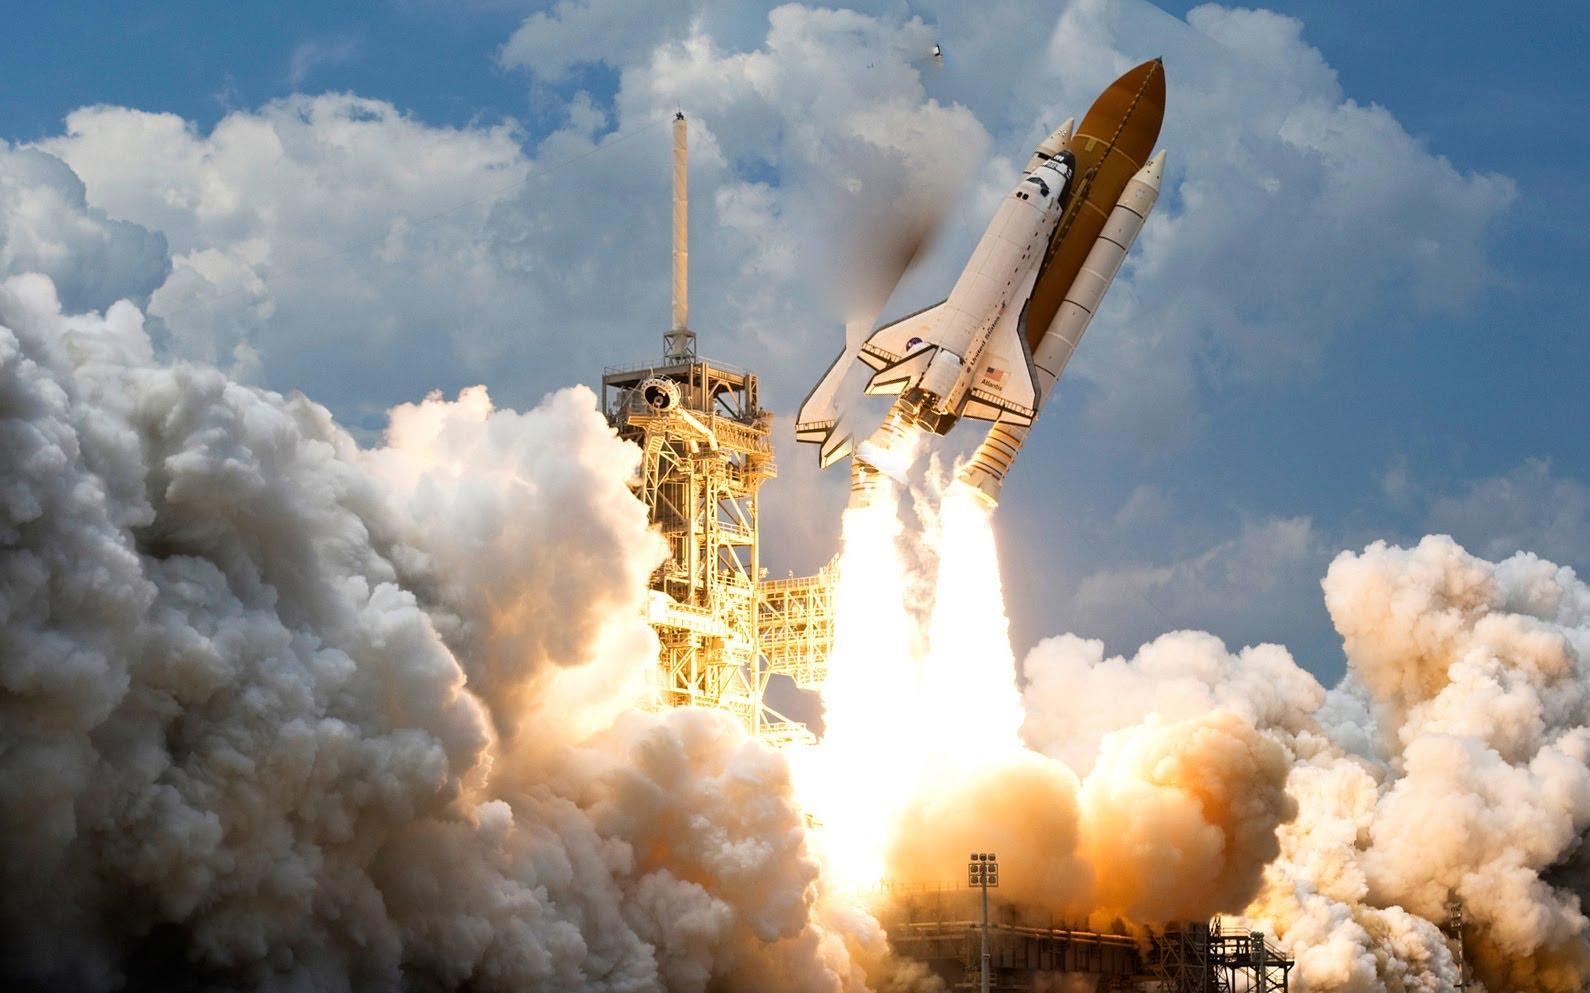 space shuttle atlantis accident - photo #41